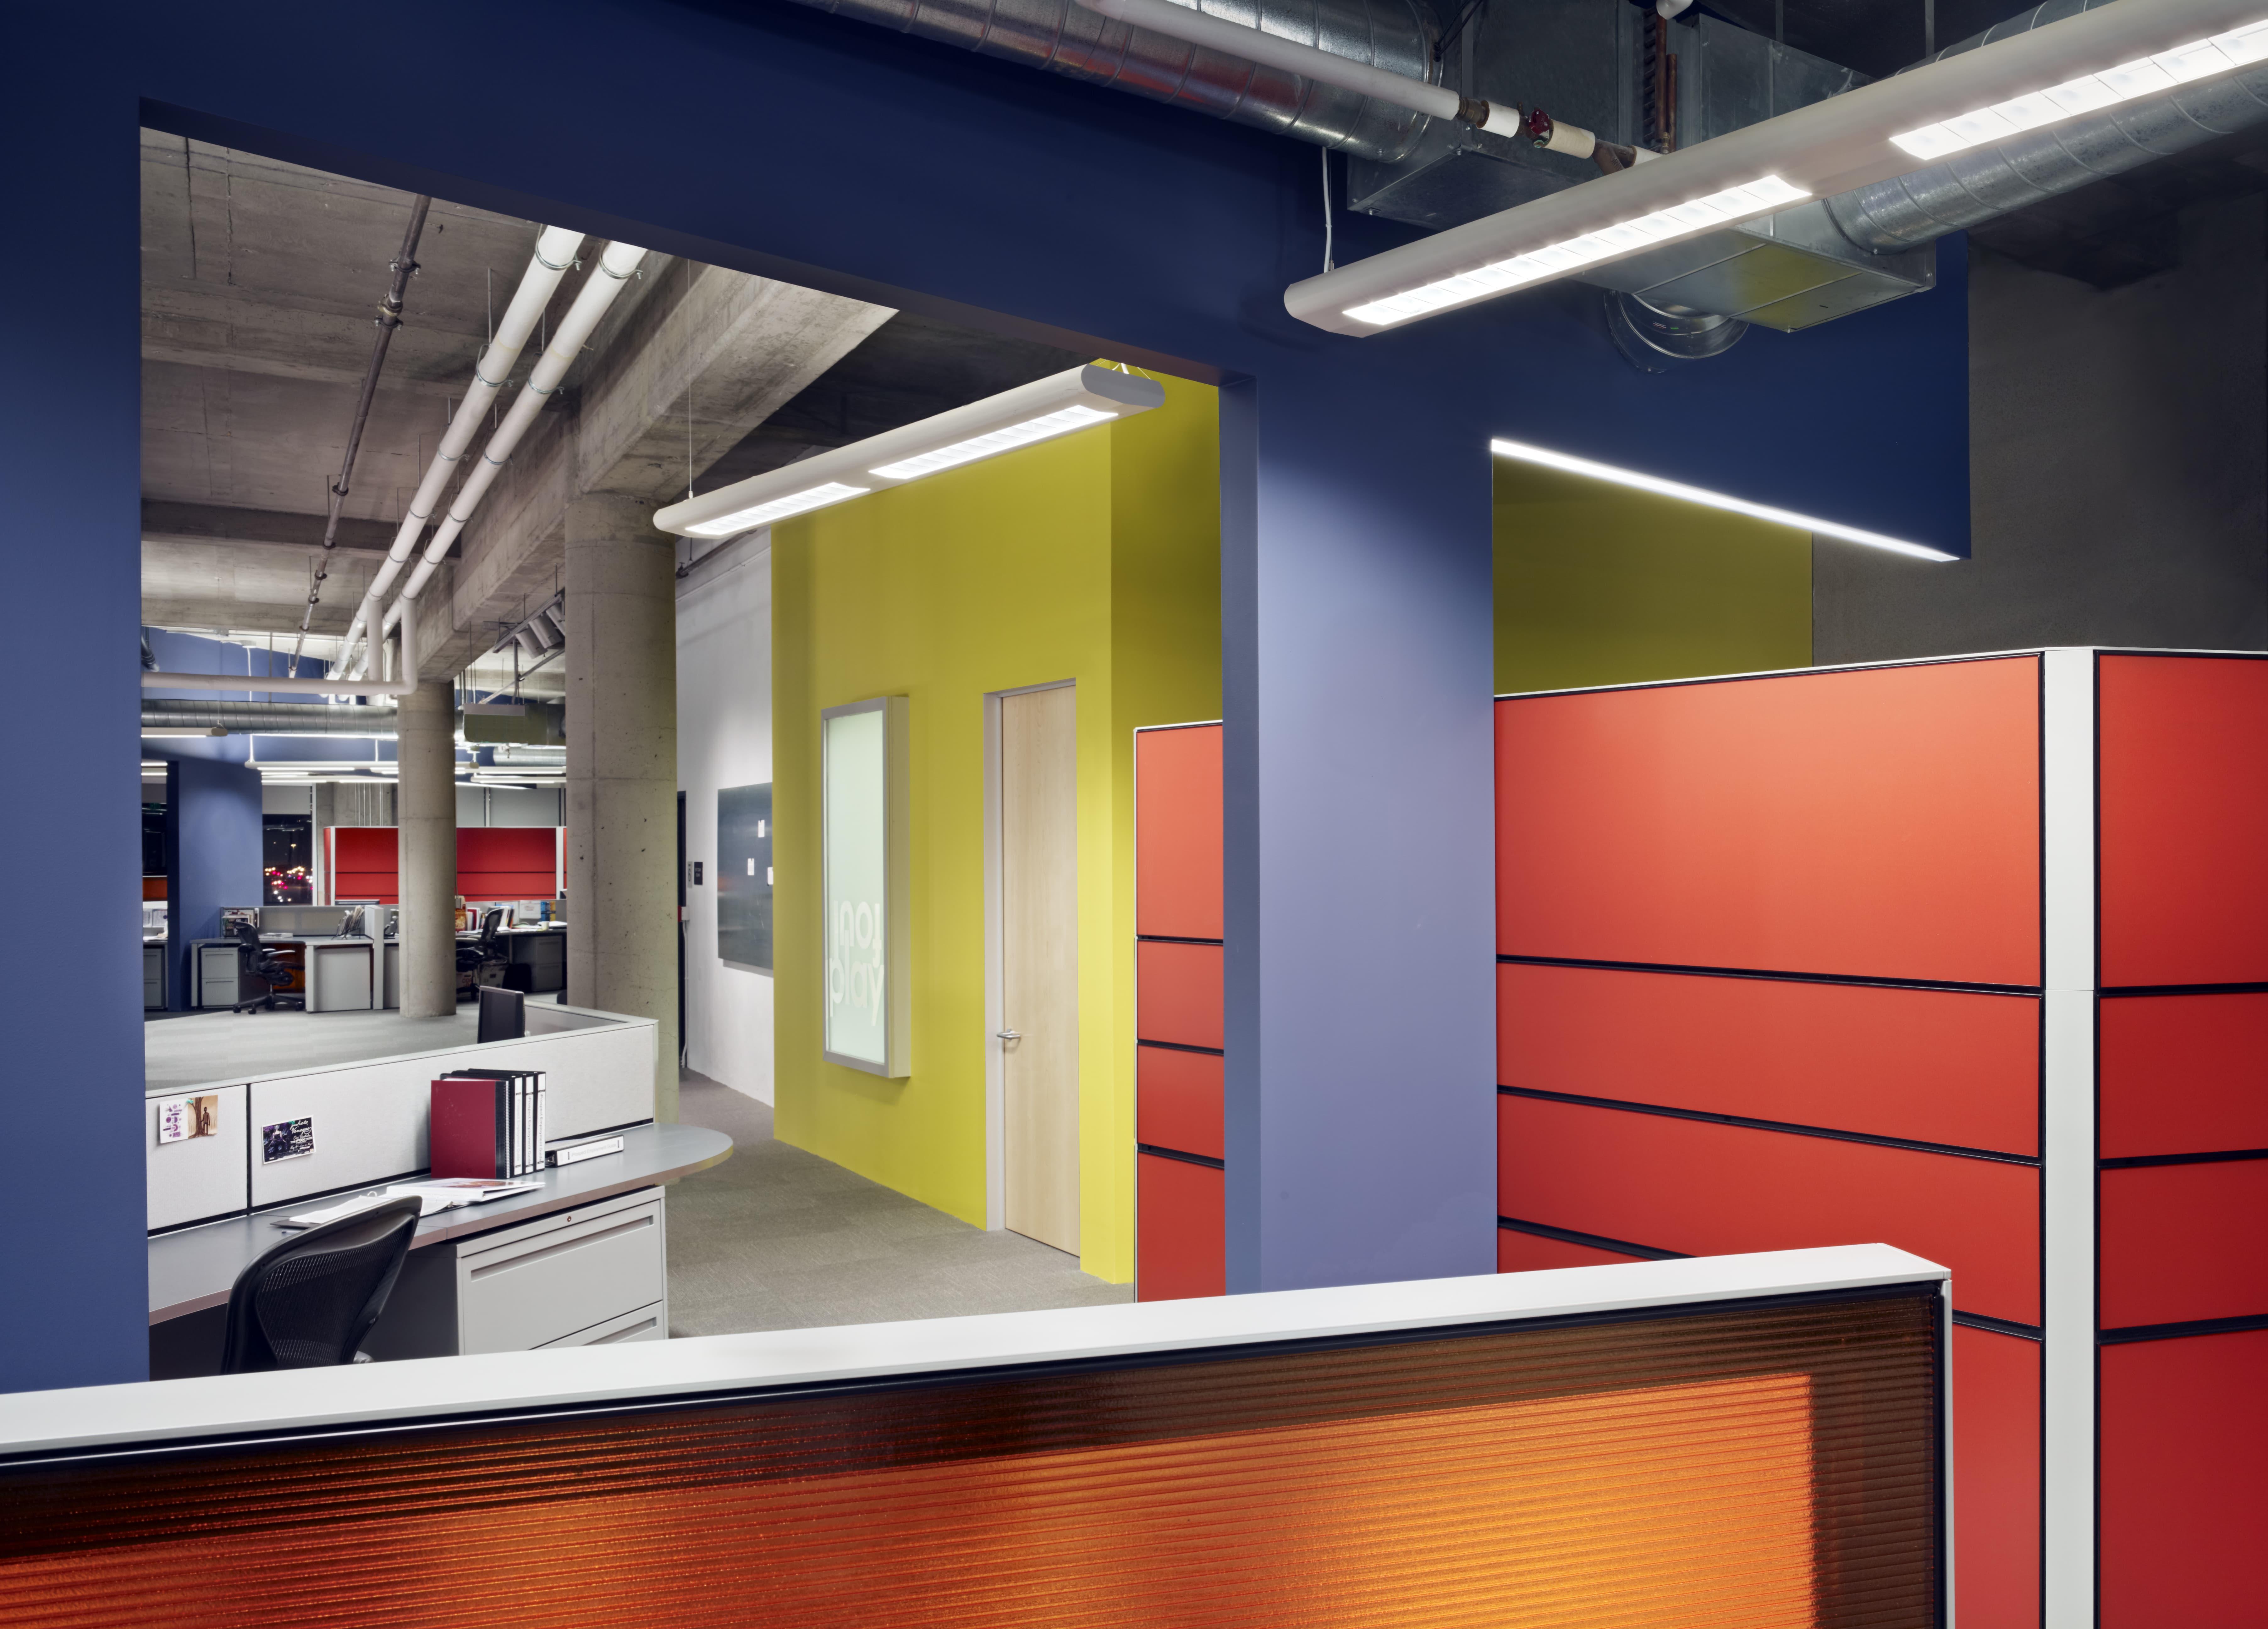 Carat \ Aegis Media by Quezada Architecture (Fred Quezada, Cecilia Quezada, Ed Tingley)